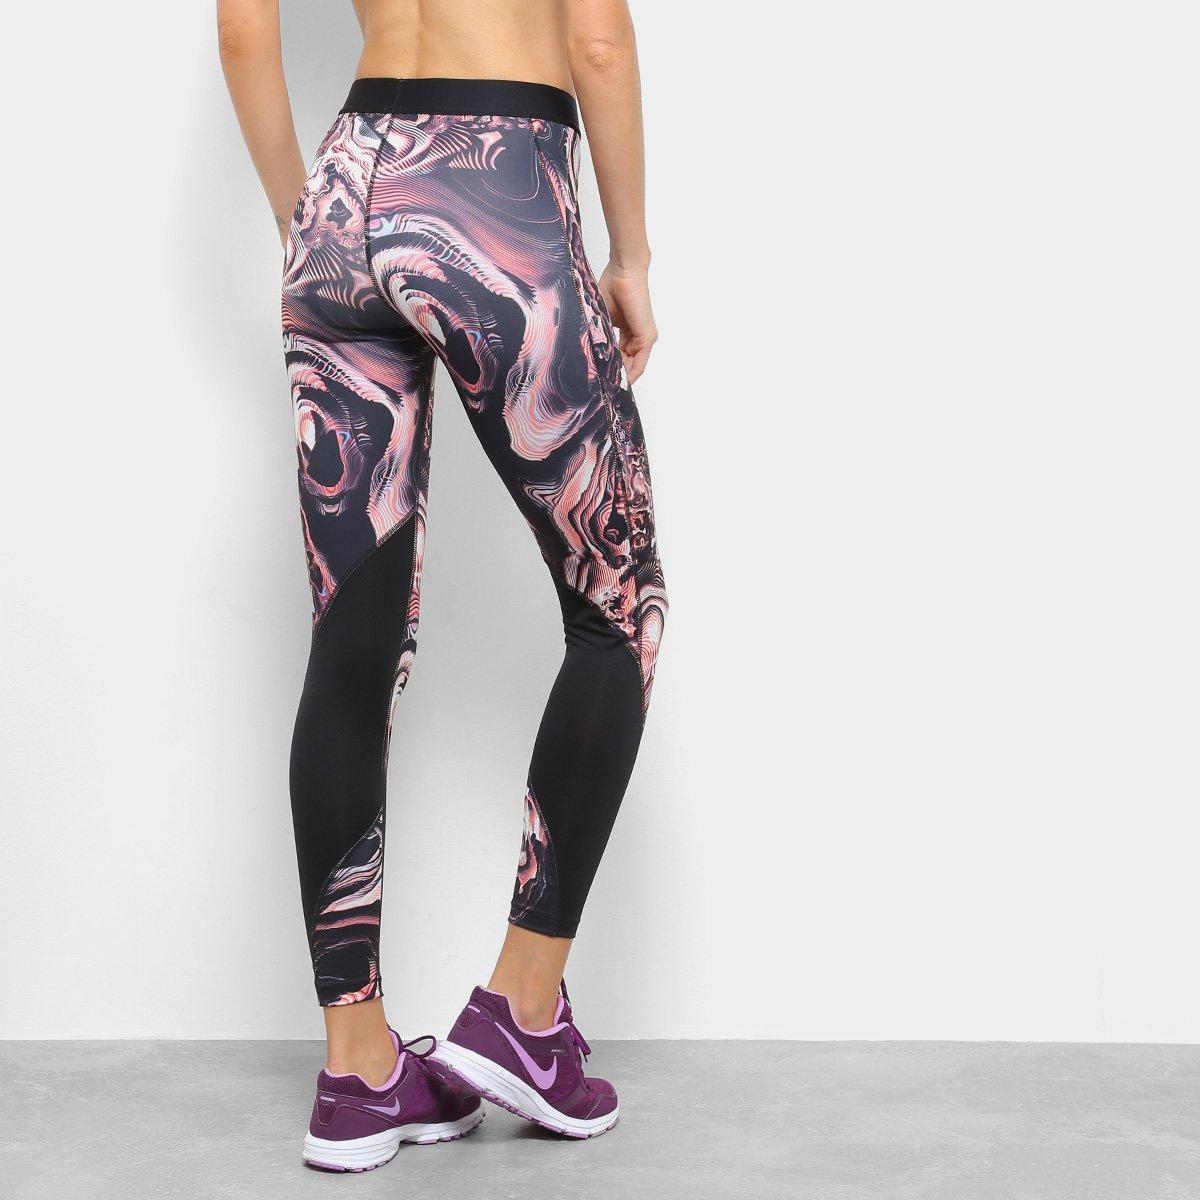 Tight Print Calça Feminina Coral Nike Nike Coral Calça BwwAtqnXx4